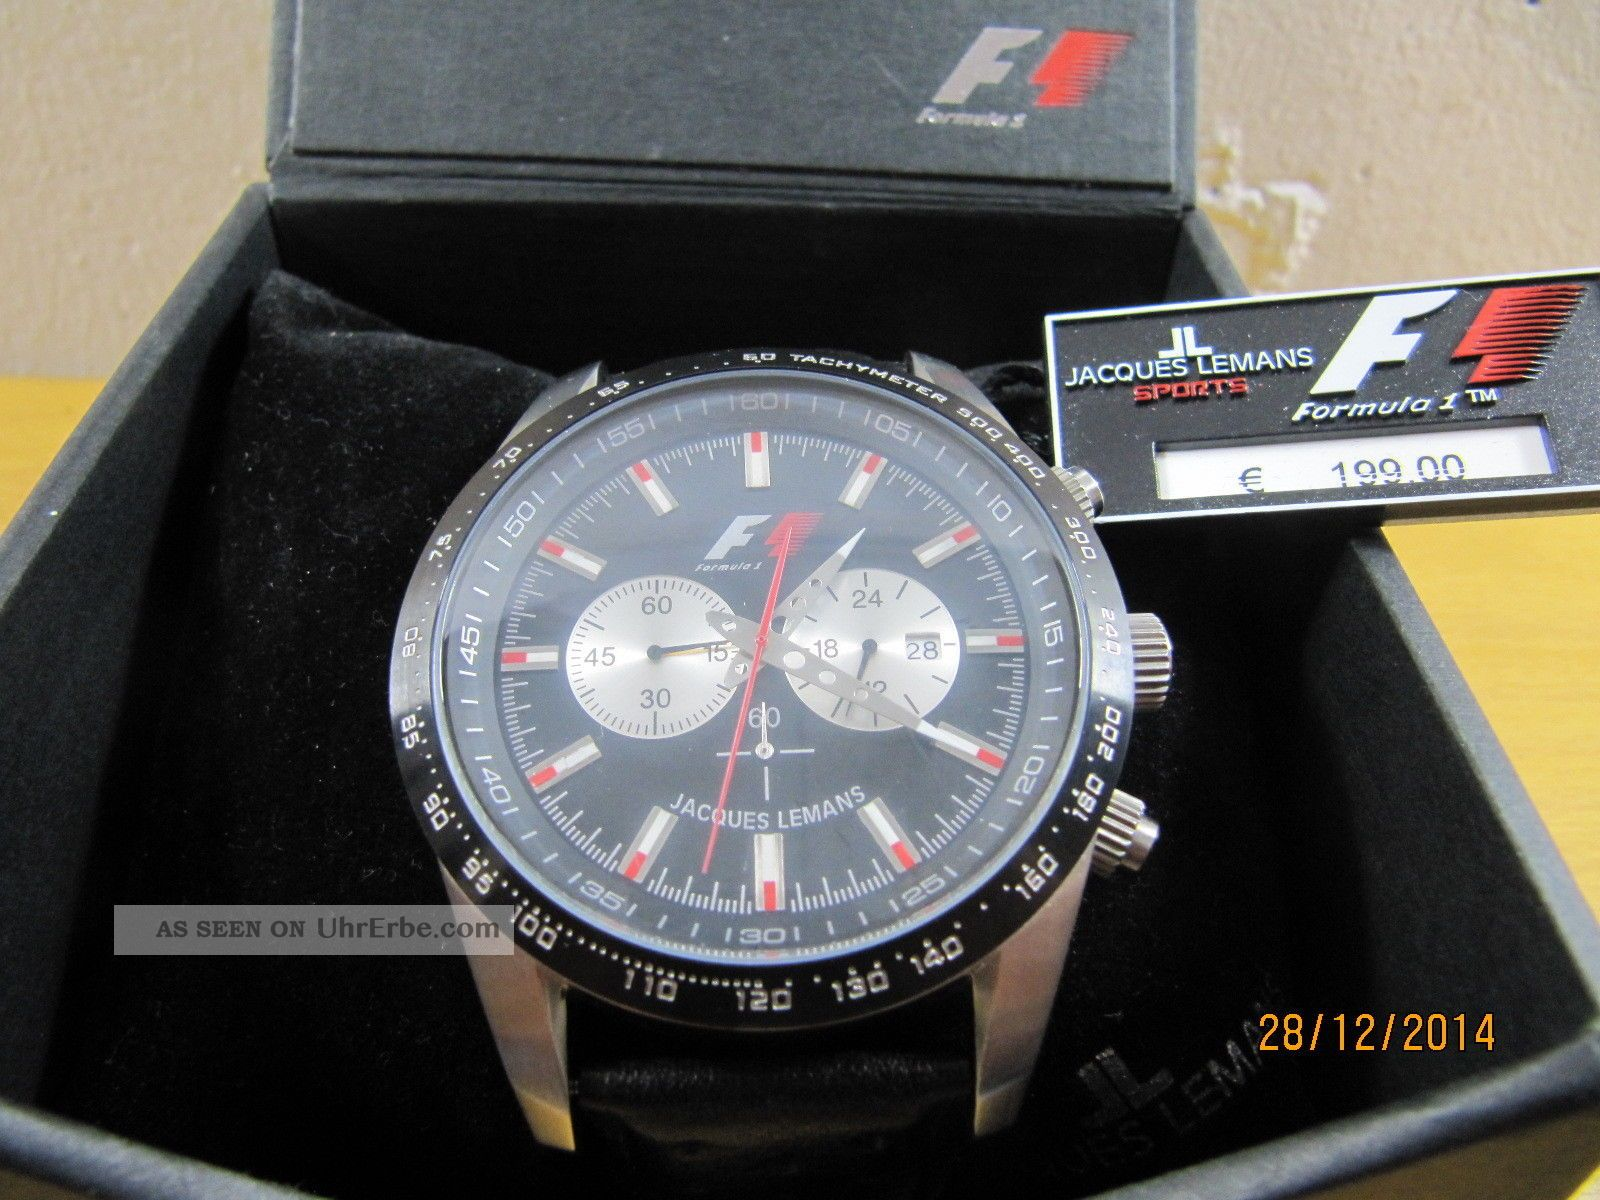 Jacques Lemans Formel 1 Retro Xxl 5018 Herren Armbanduhr Uhr Selten Top Armbanduhren Bild